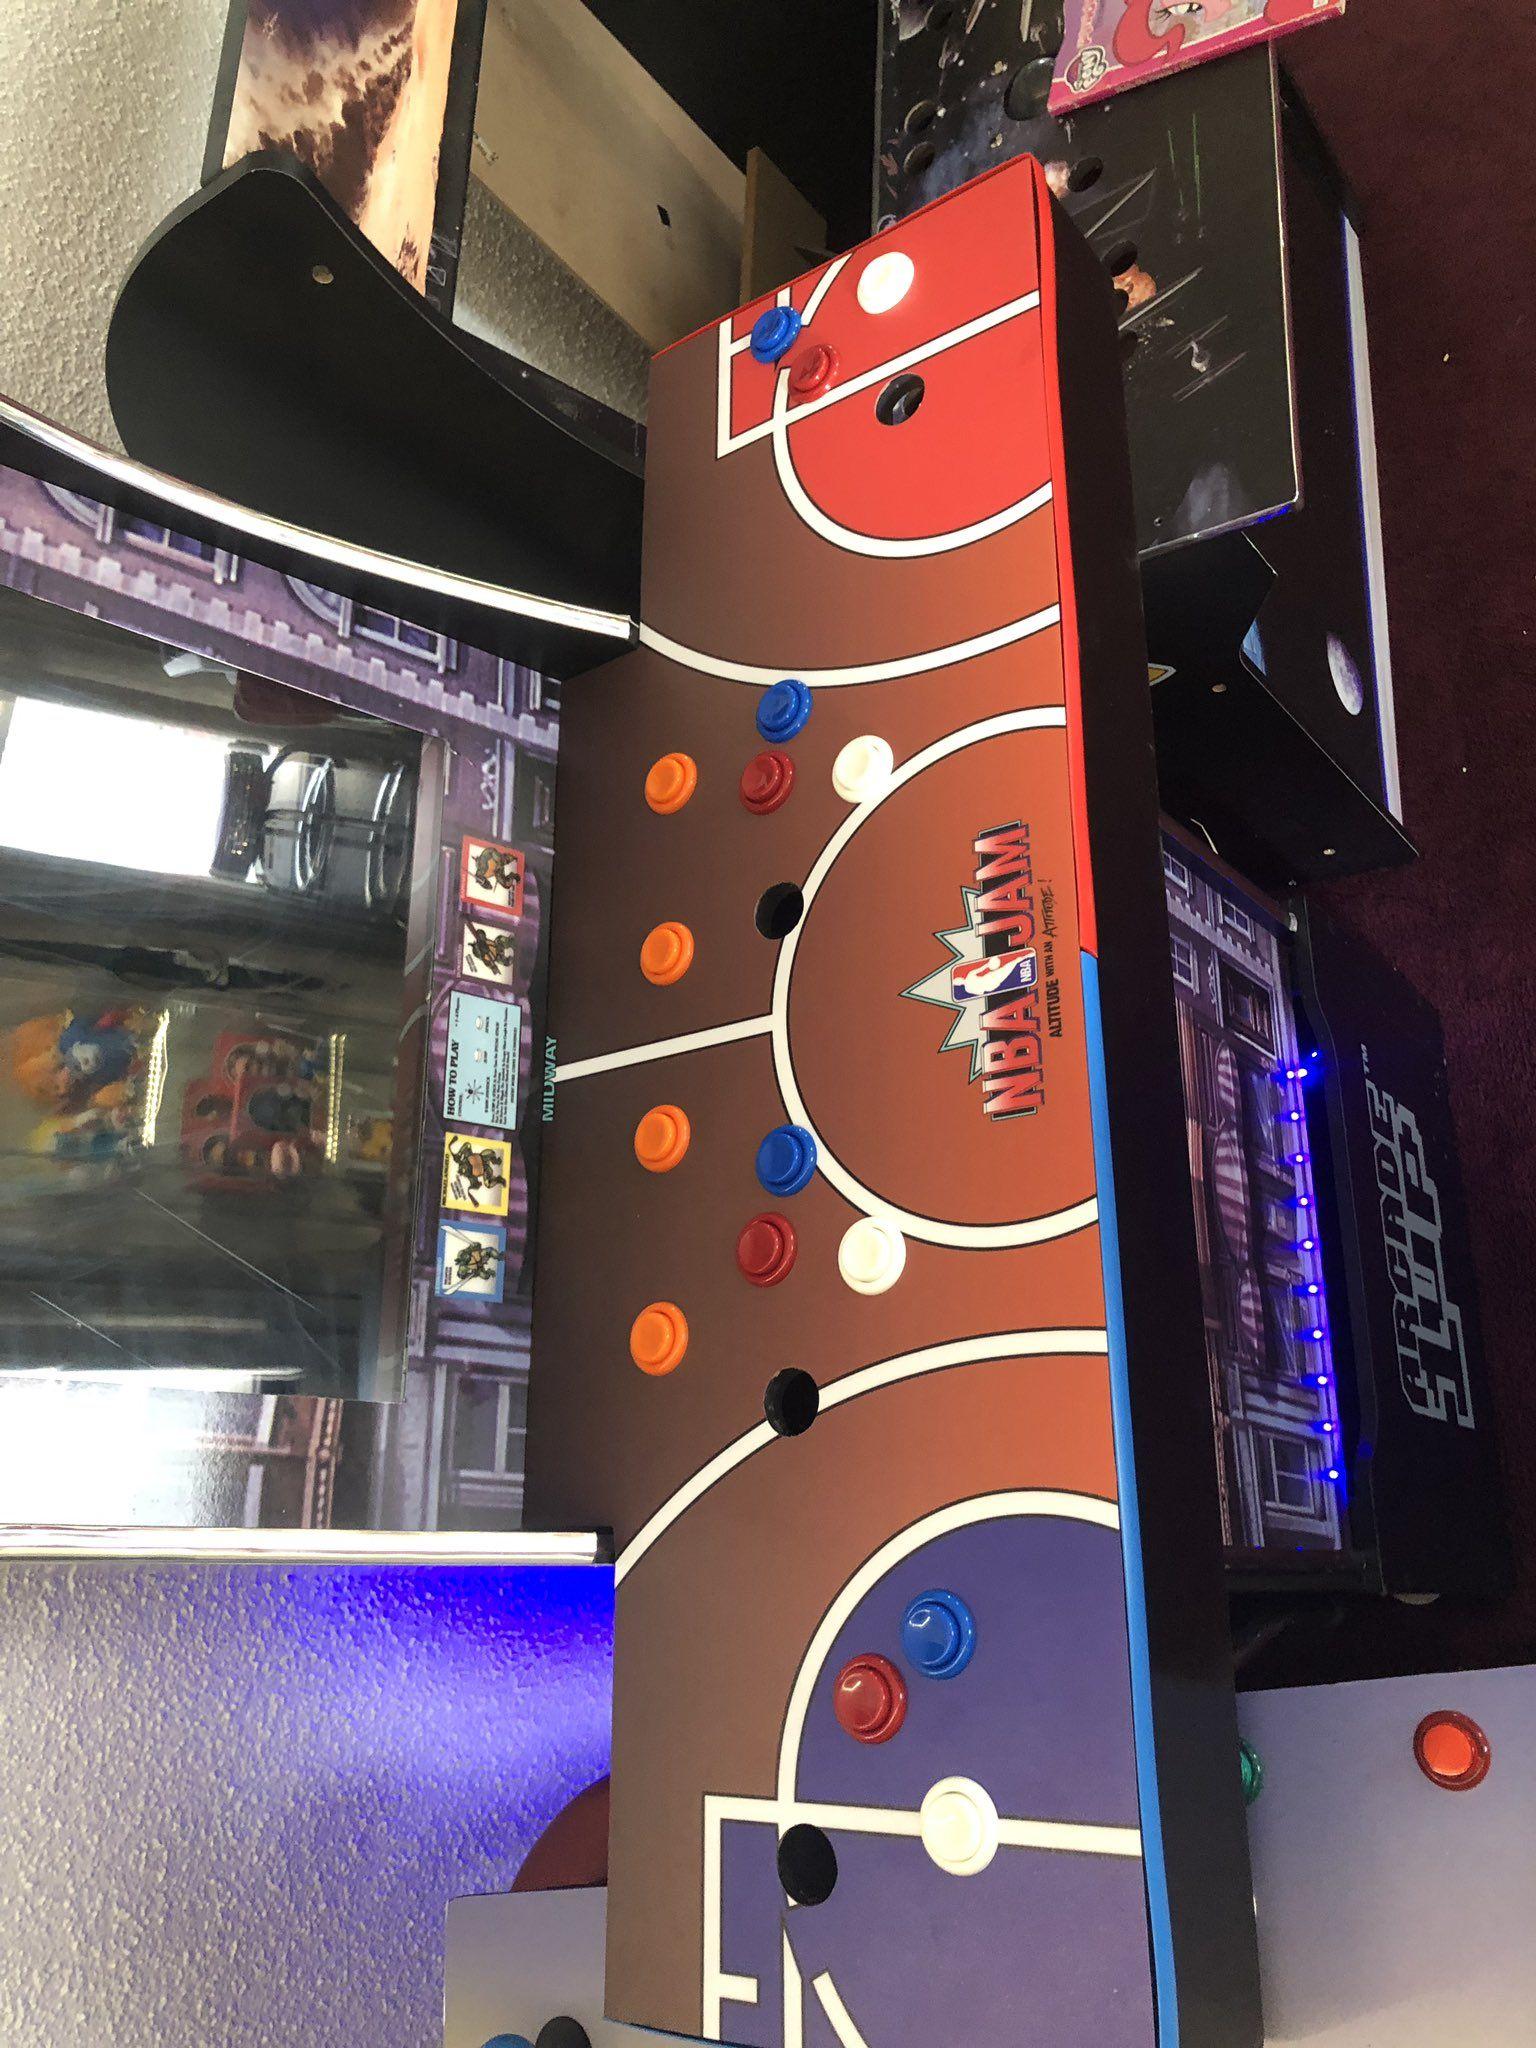 99livesarcade on | Arcade1up customization and more | Arcade games